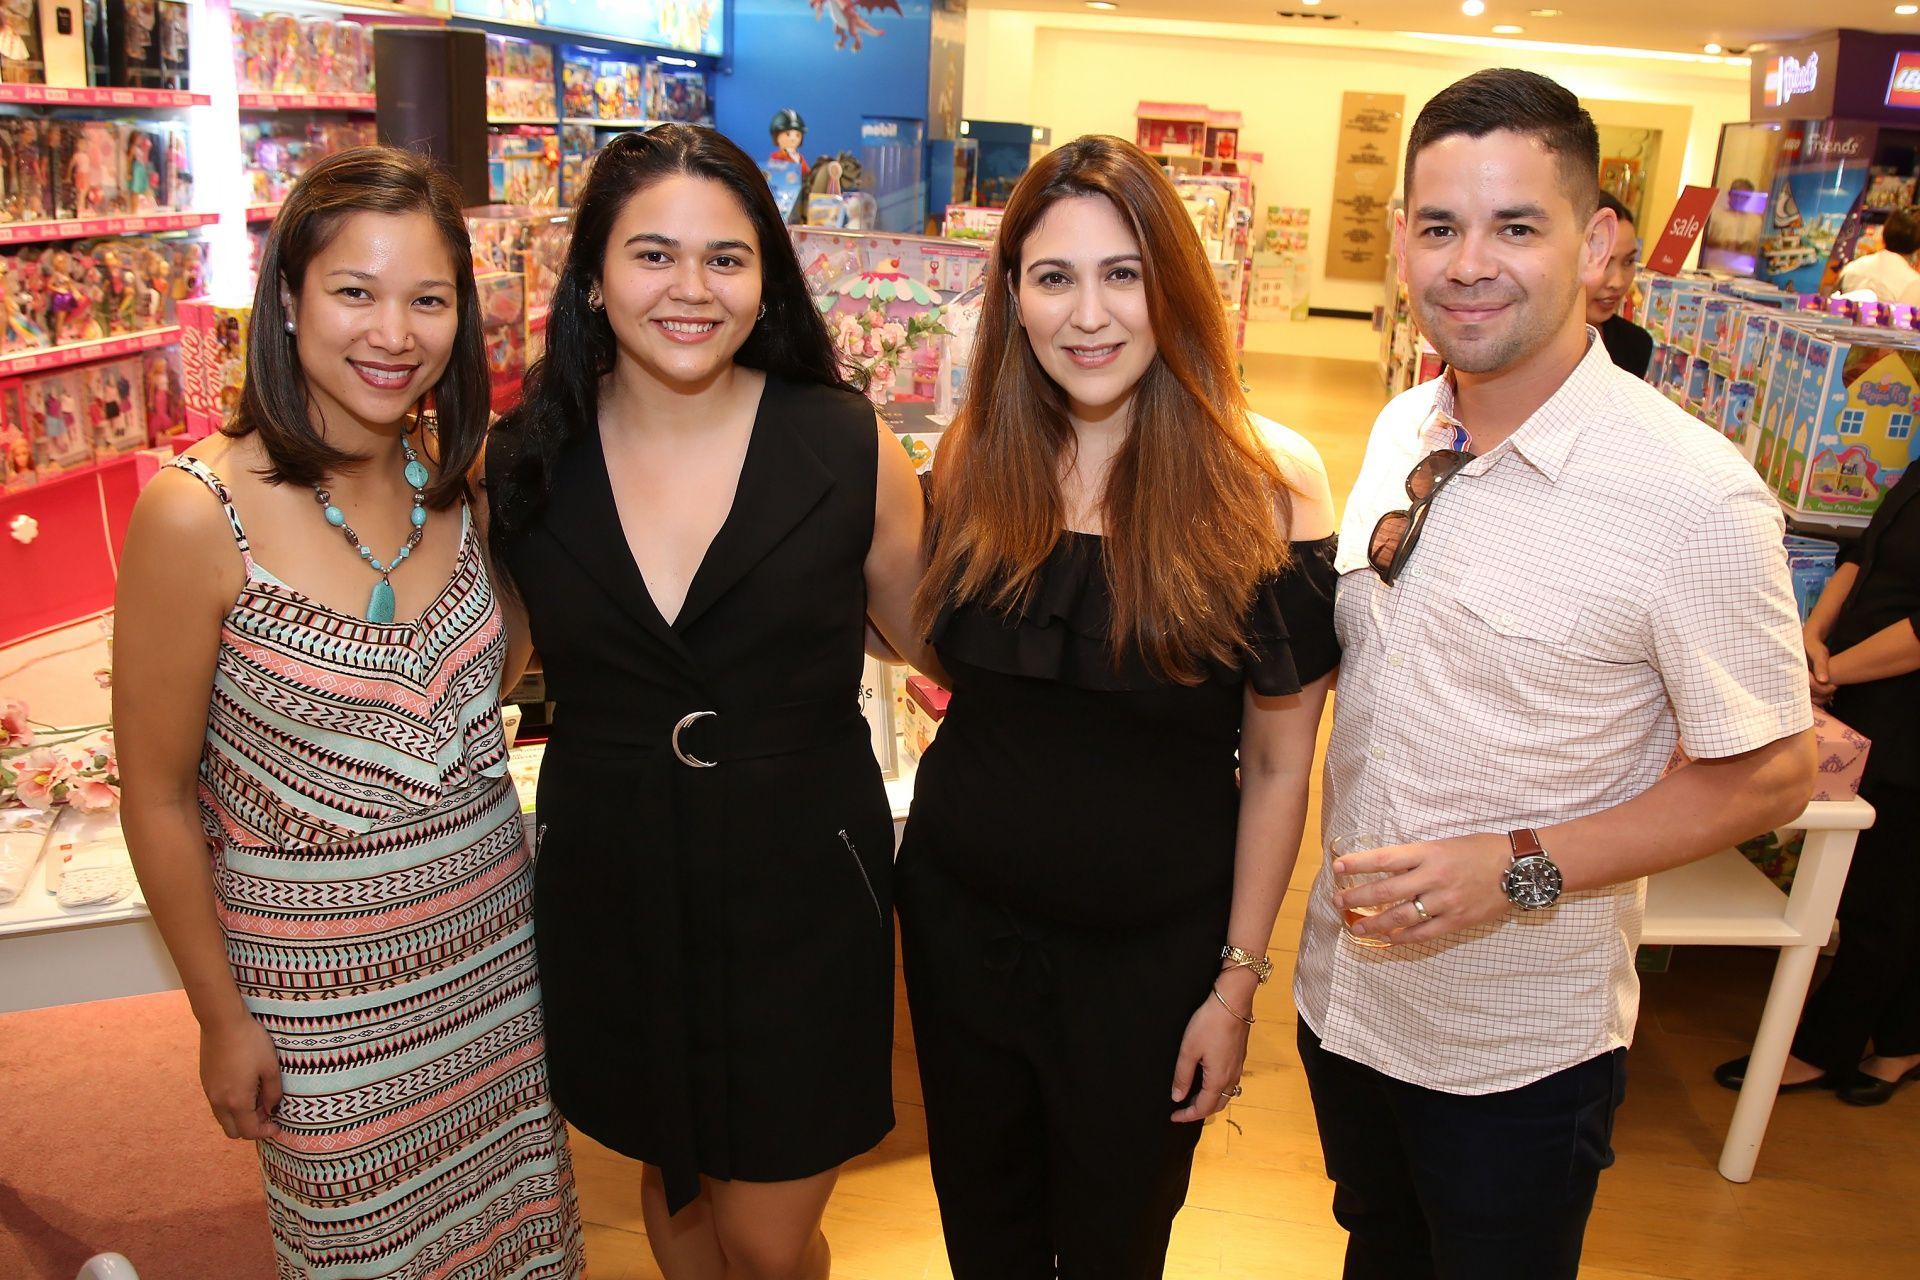 Isabel Chongbian Heredia, Ines Barretto, Amaya Barretto, Charley Heredia